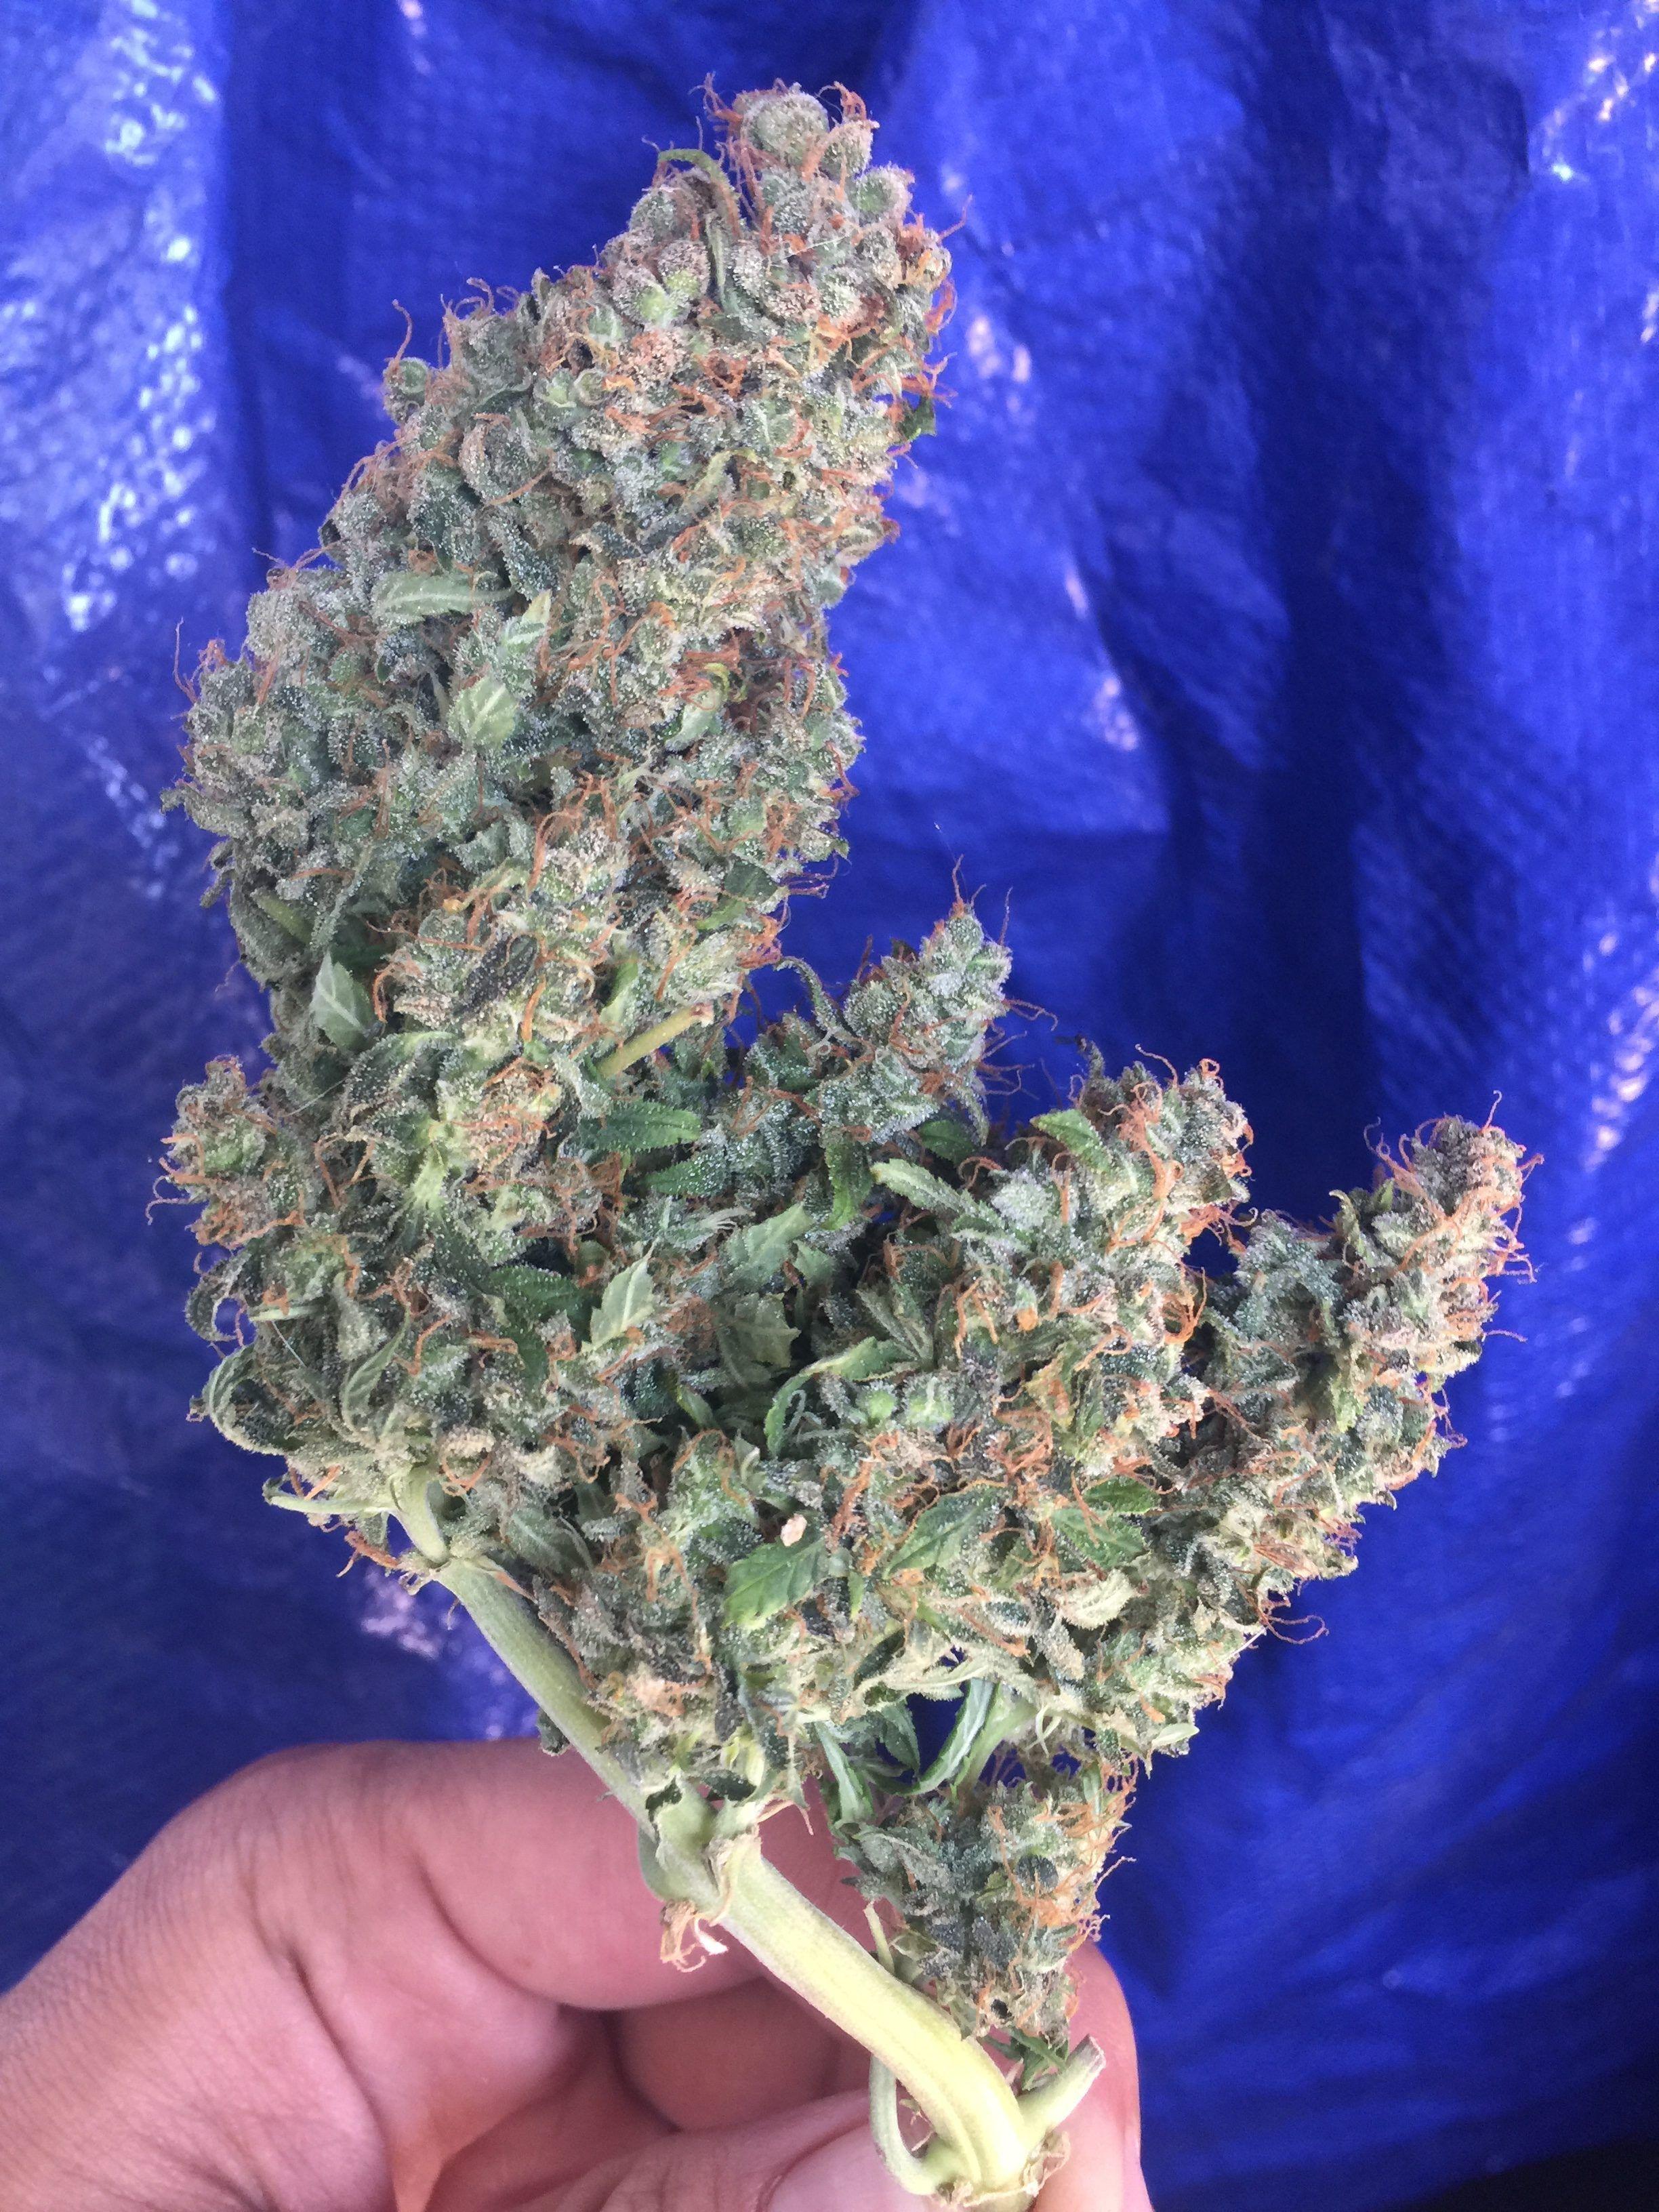 Hindu Kush Autoflower Grow Journal, Micro grow - Harvest